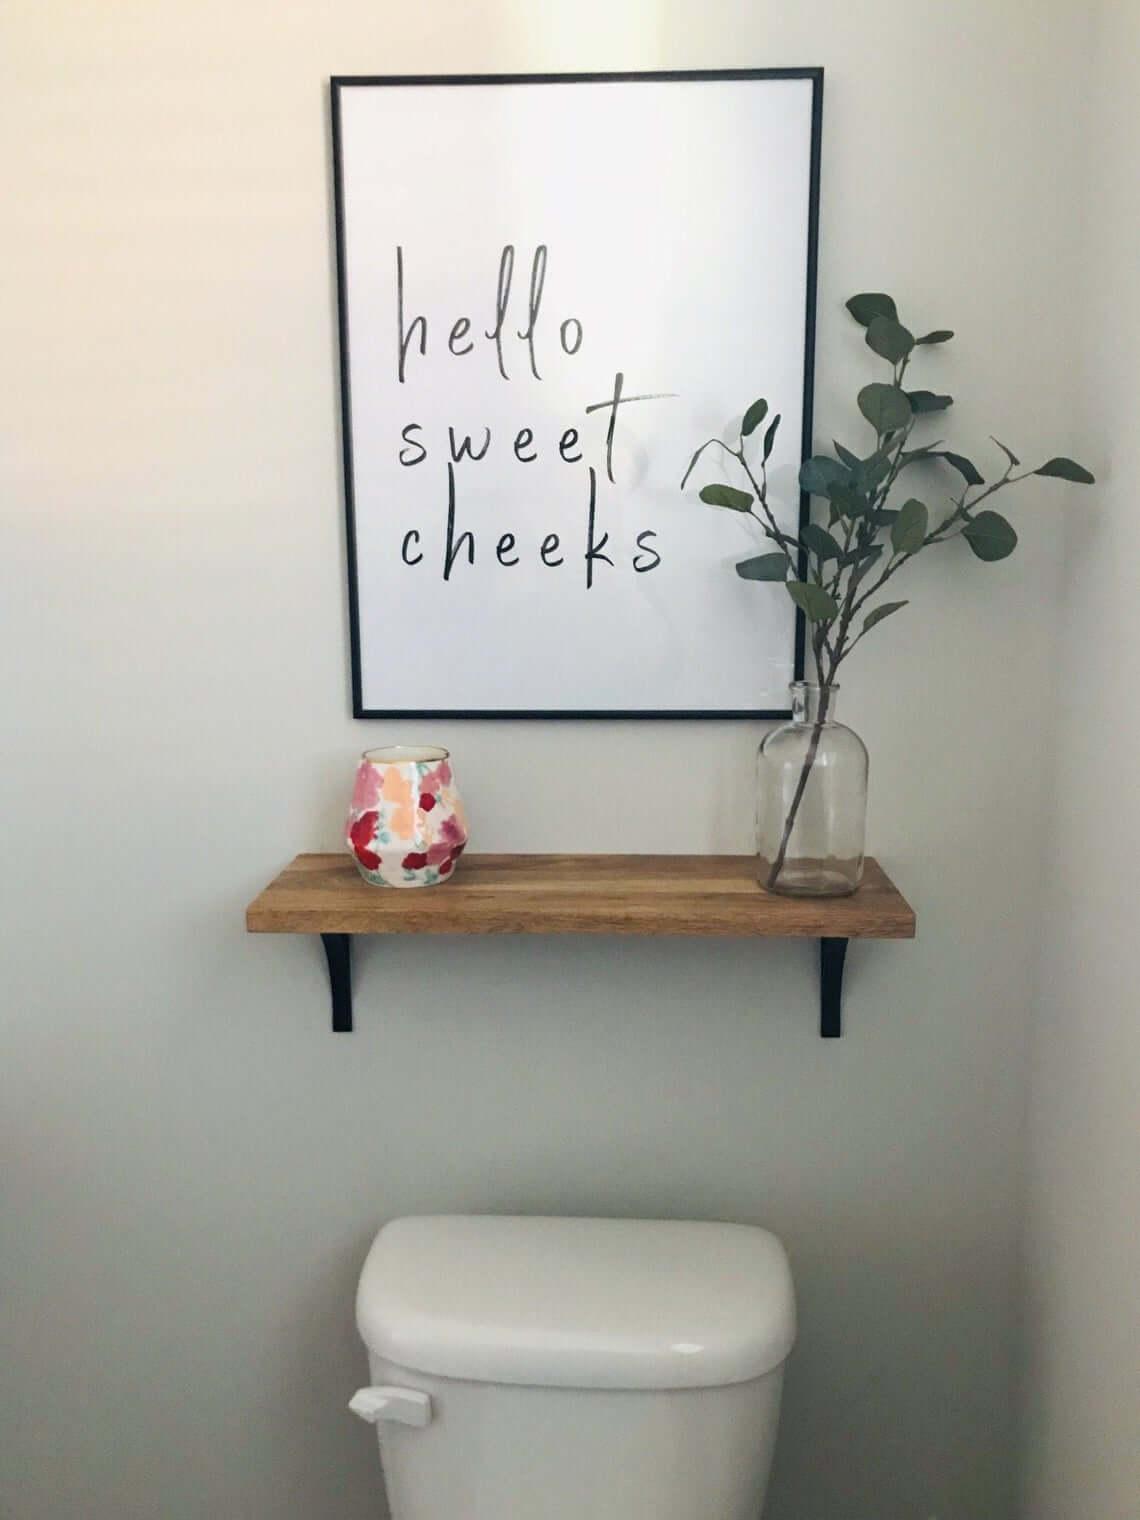 Simply Spunky and Fresh Bathroom Decor